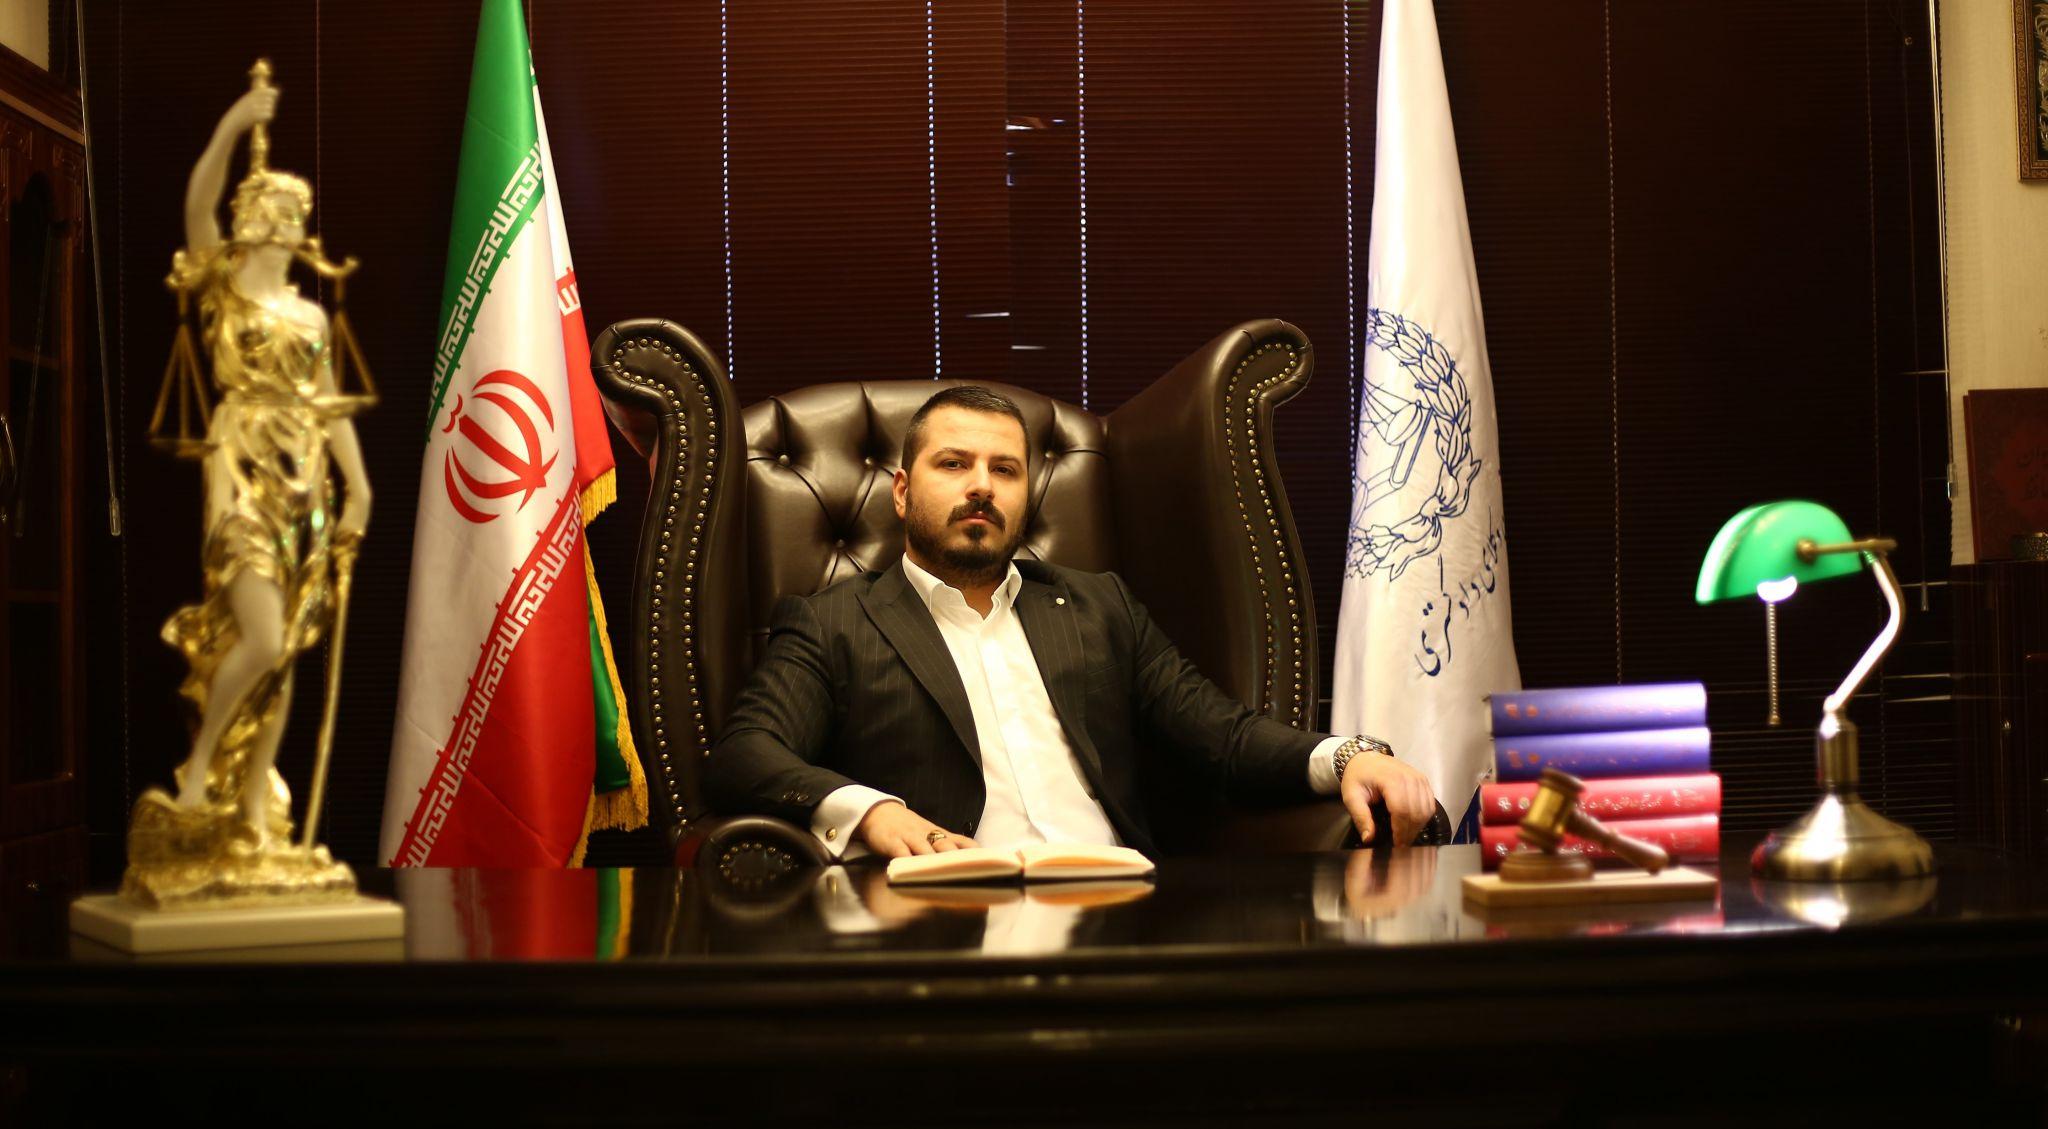 Ali Mohsenzadeh - Iranian lawyer abroad